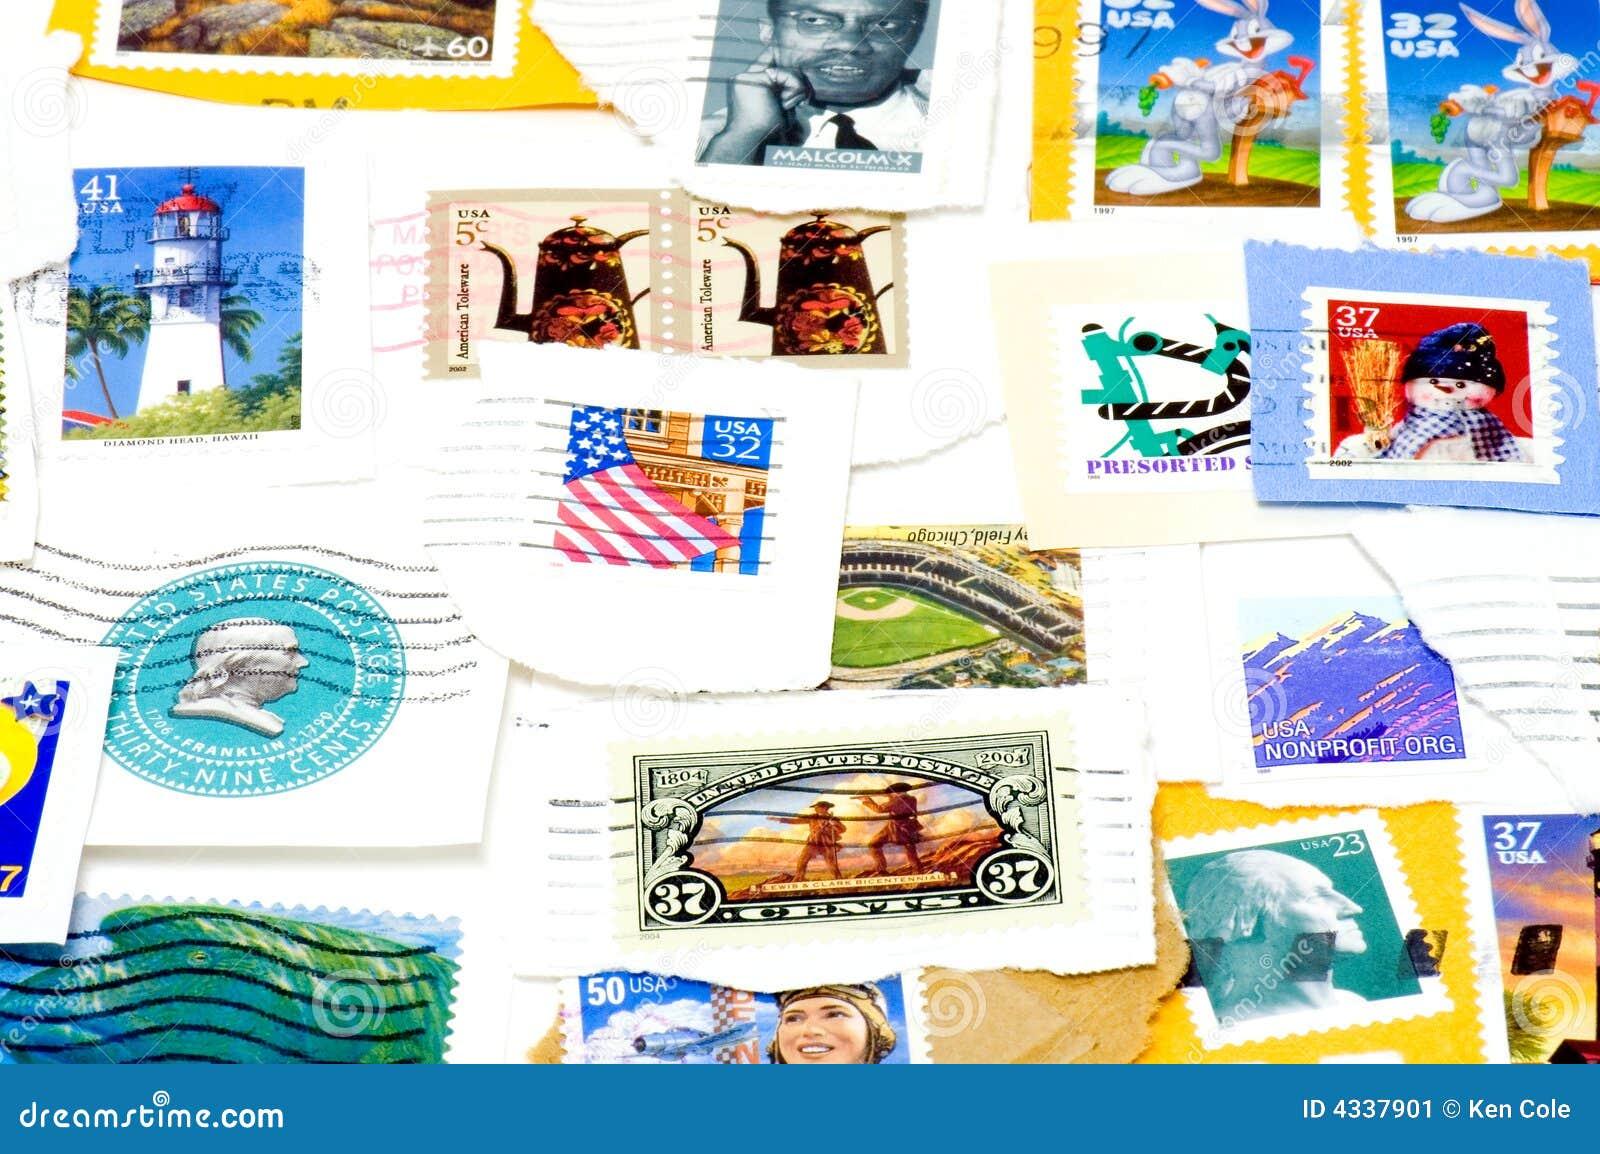 Canceled US postage stamps